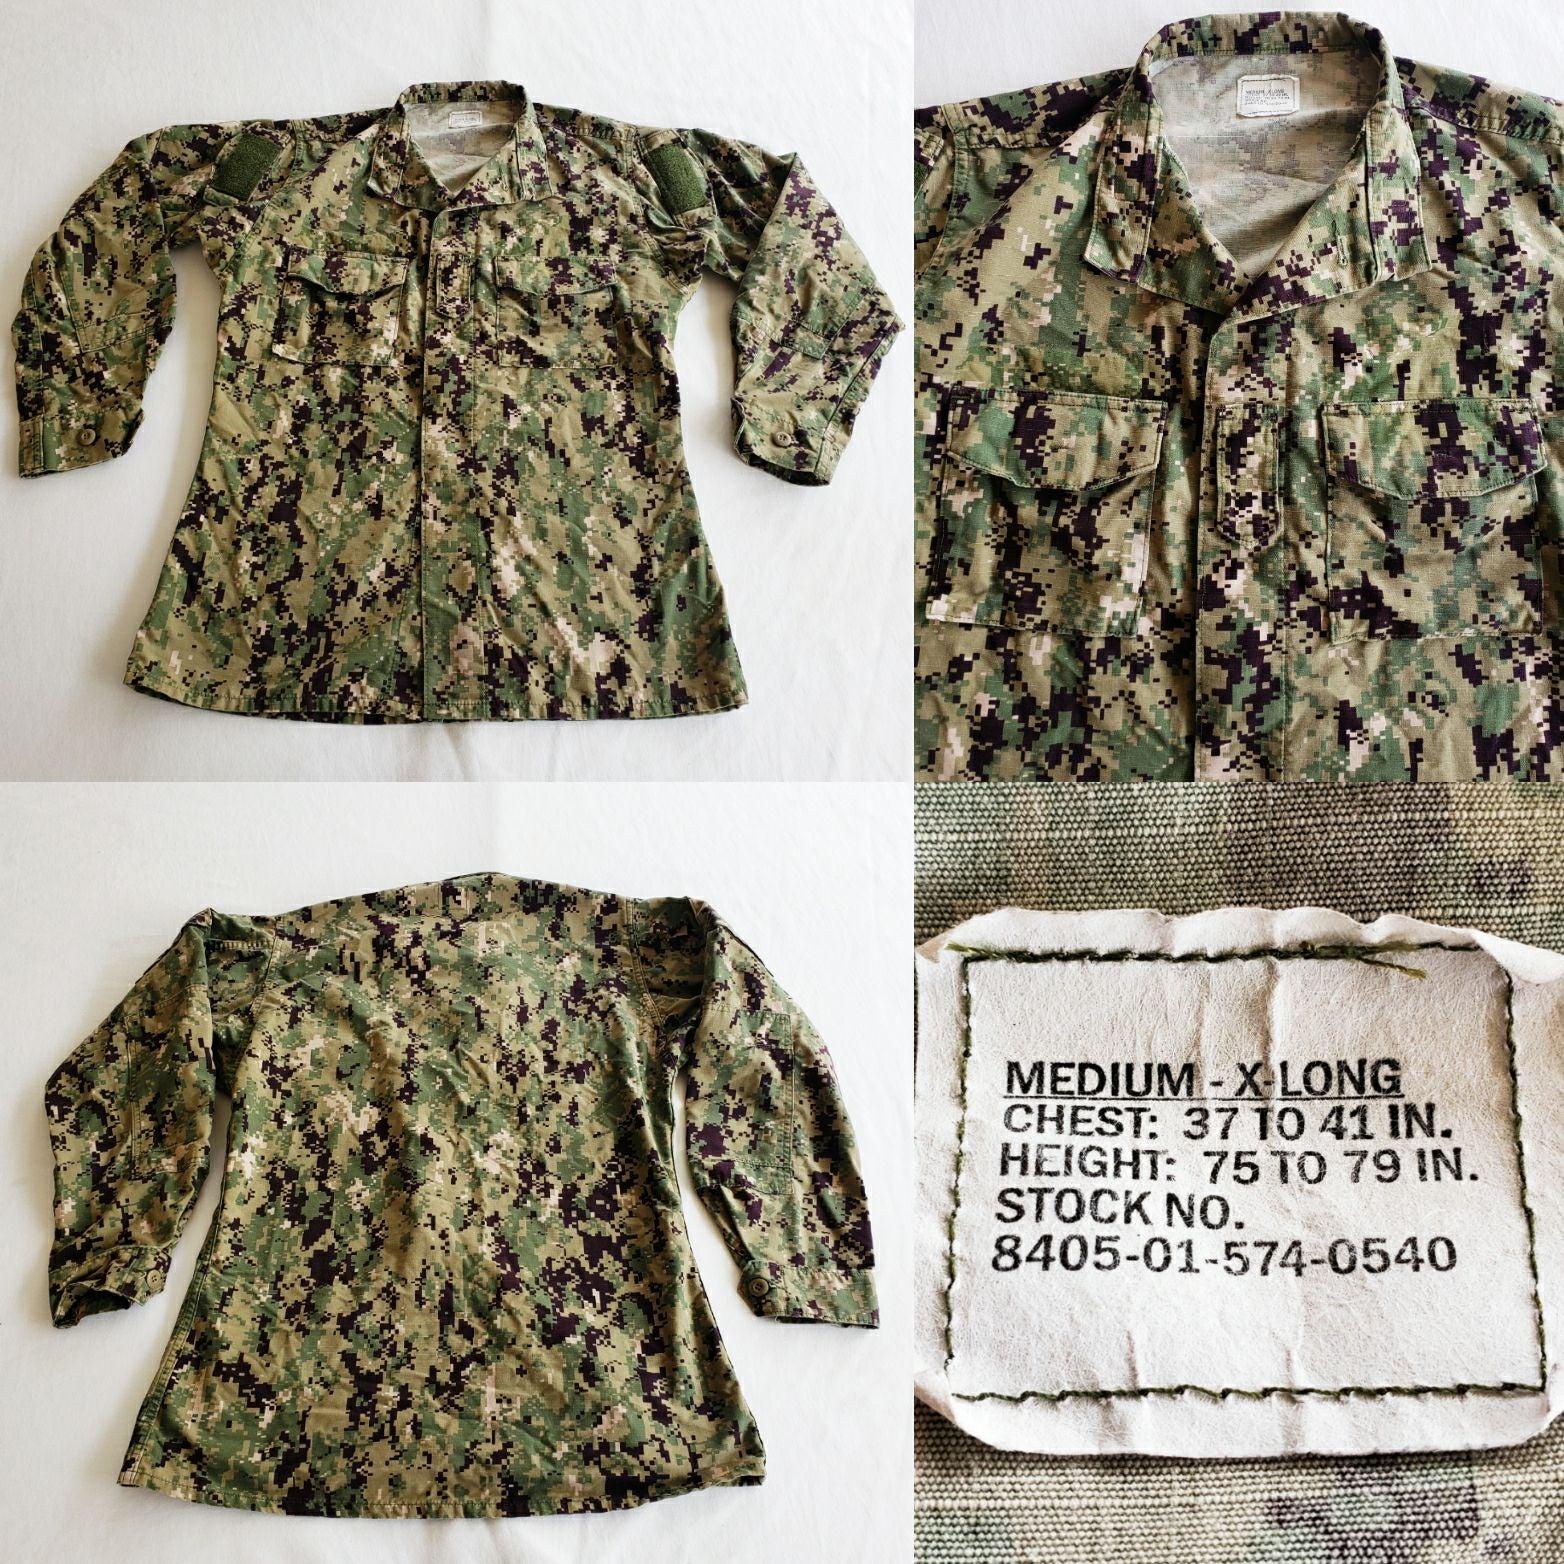 Official Navy USN Digital Camo Jacket M